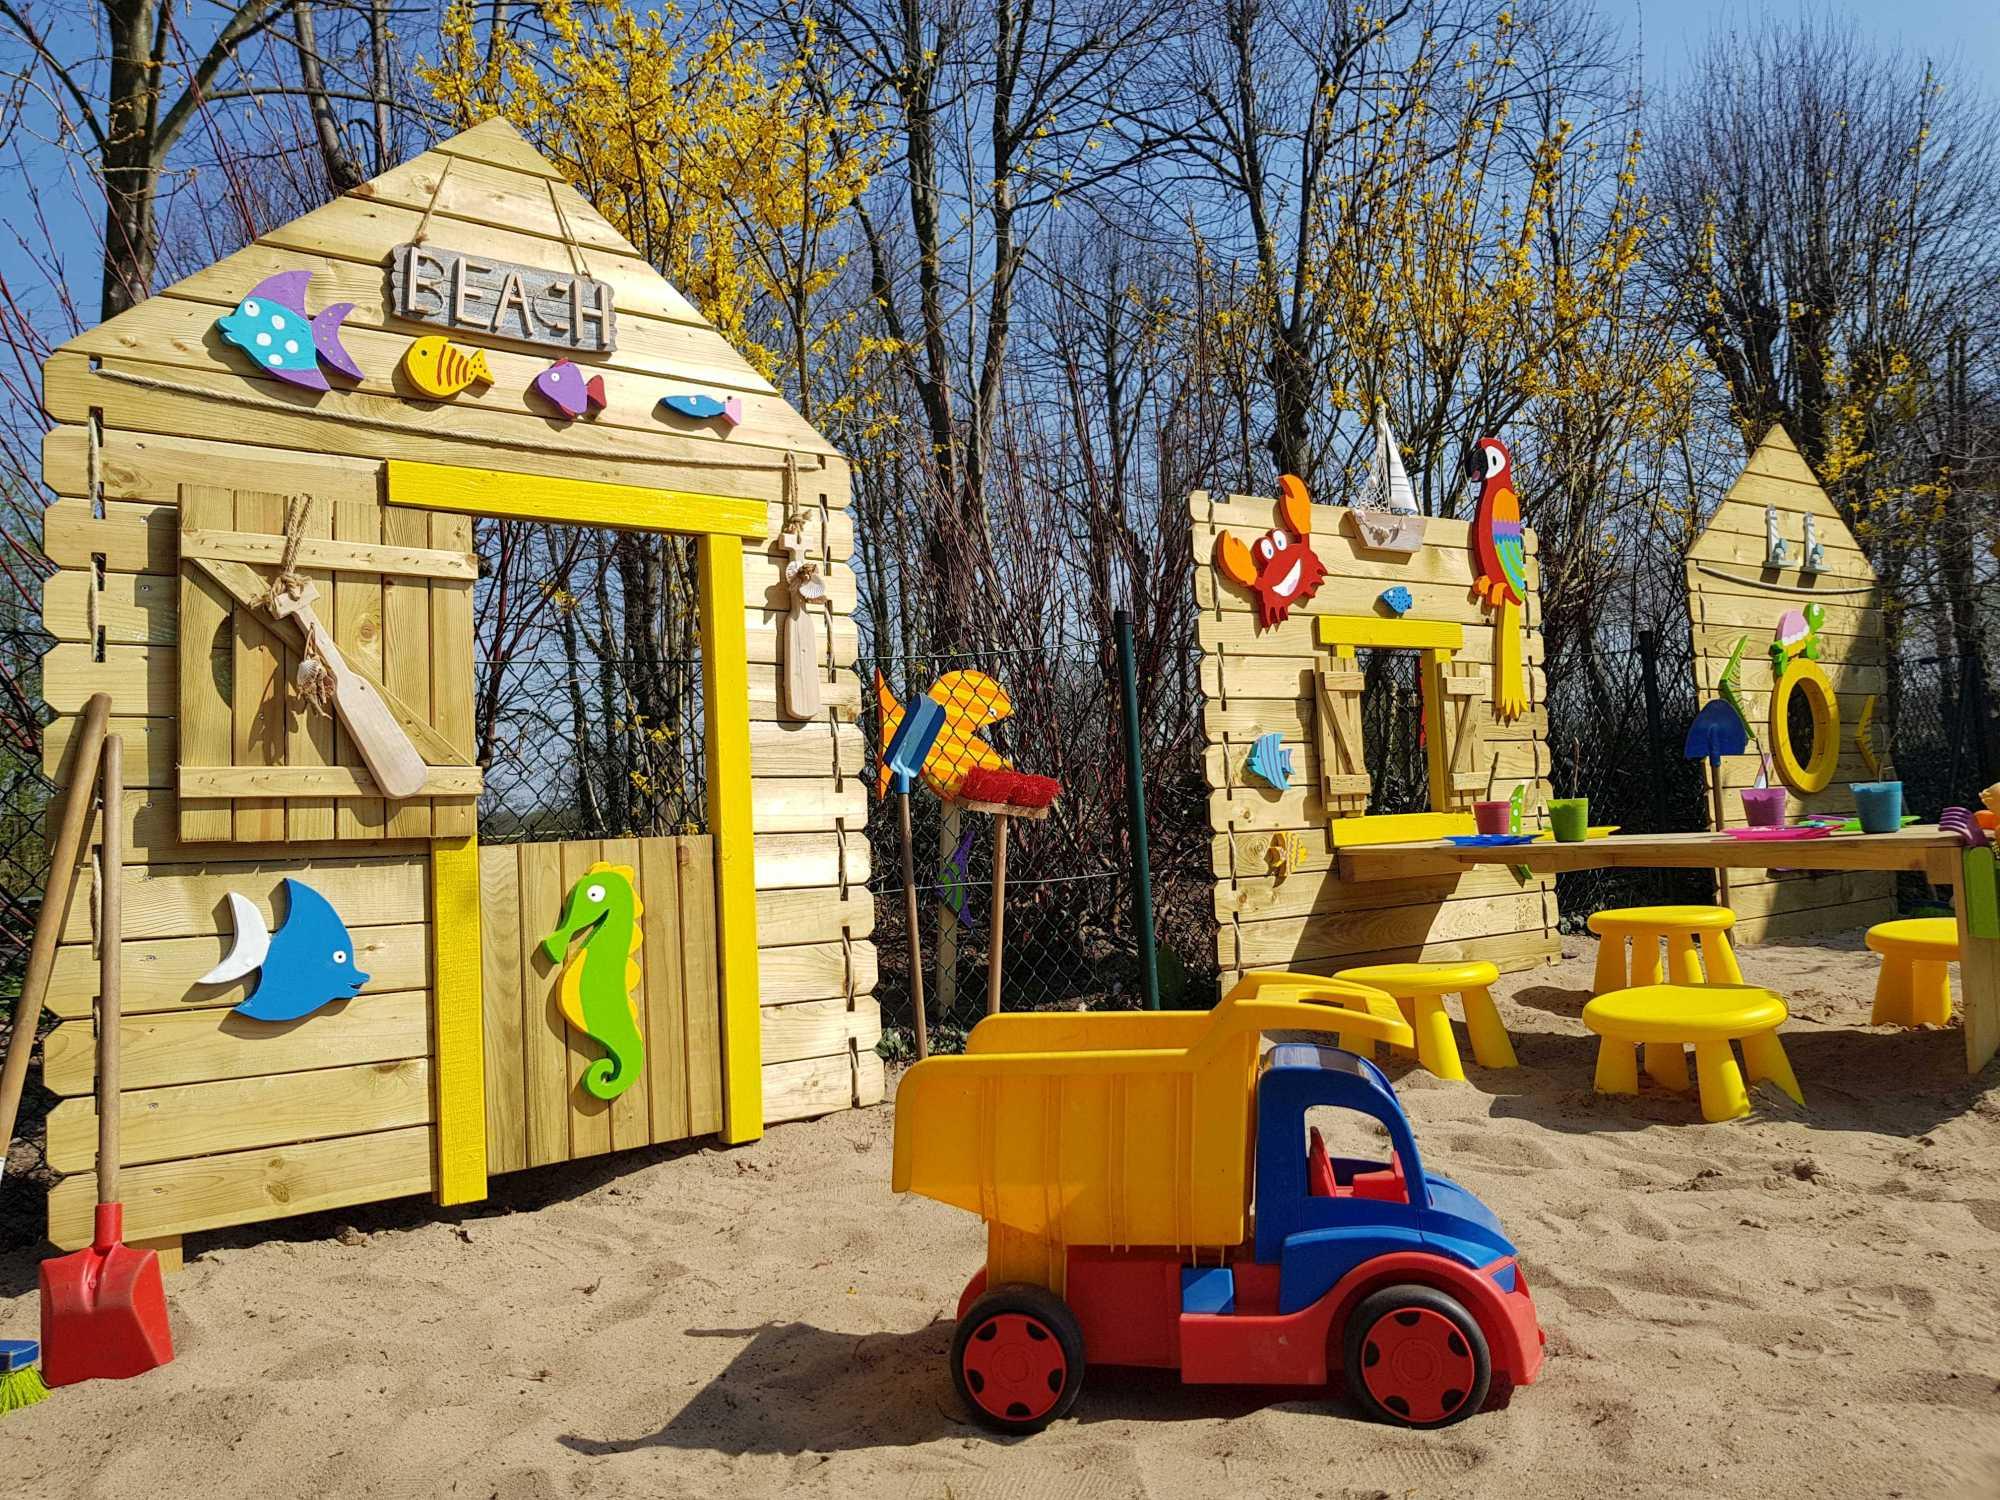 Kita Kid Zone Kinderbetreuung Garten1 10 - Kinder-Beachclub